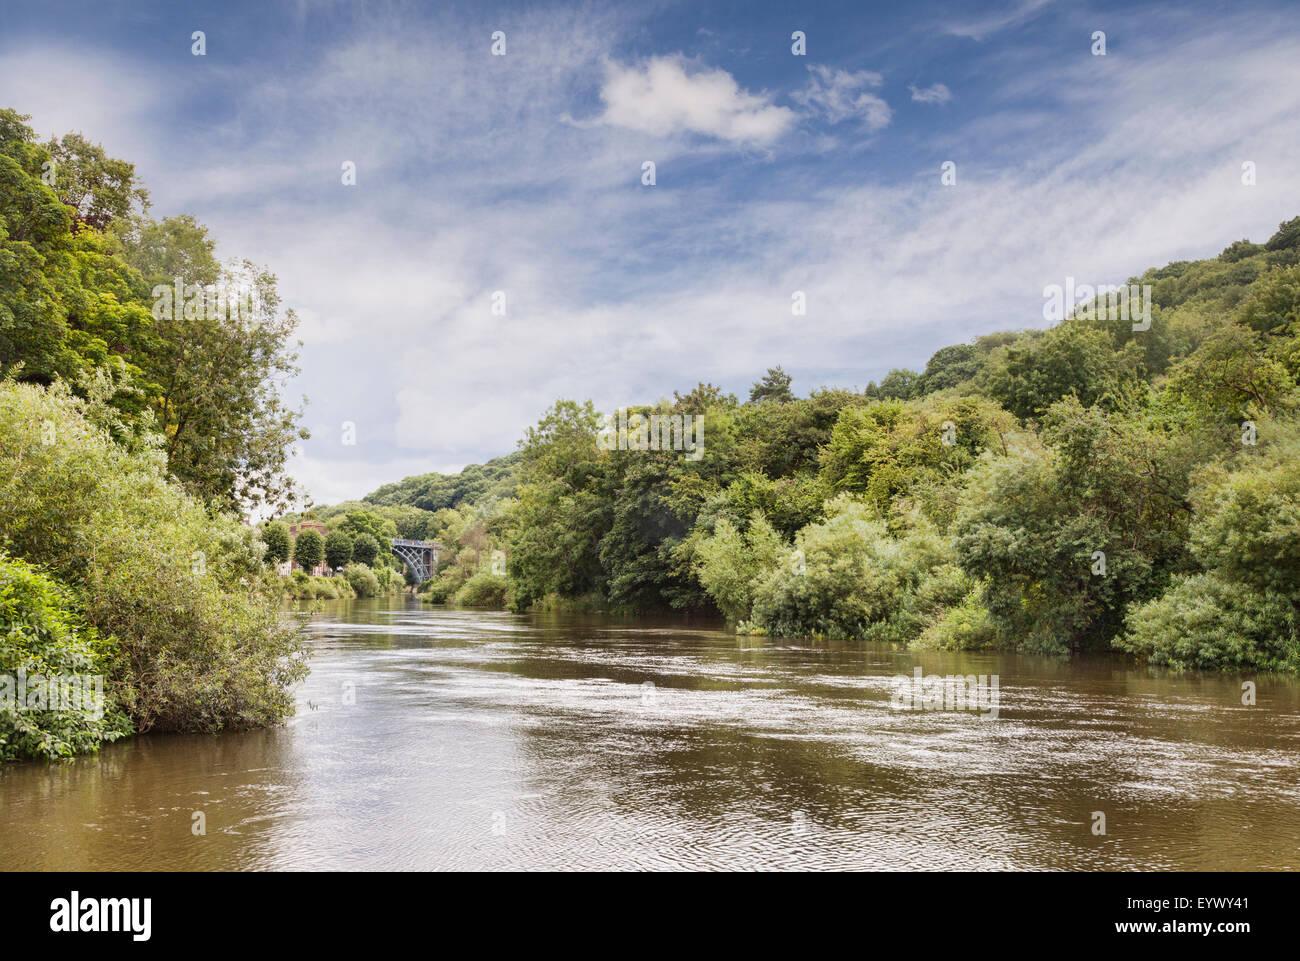 Ironbridge Gorge and the River Severn, Ironbridge, Shropshire, England - Stock Image